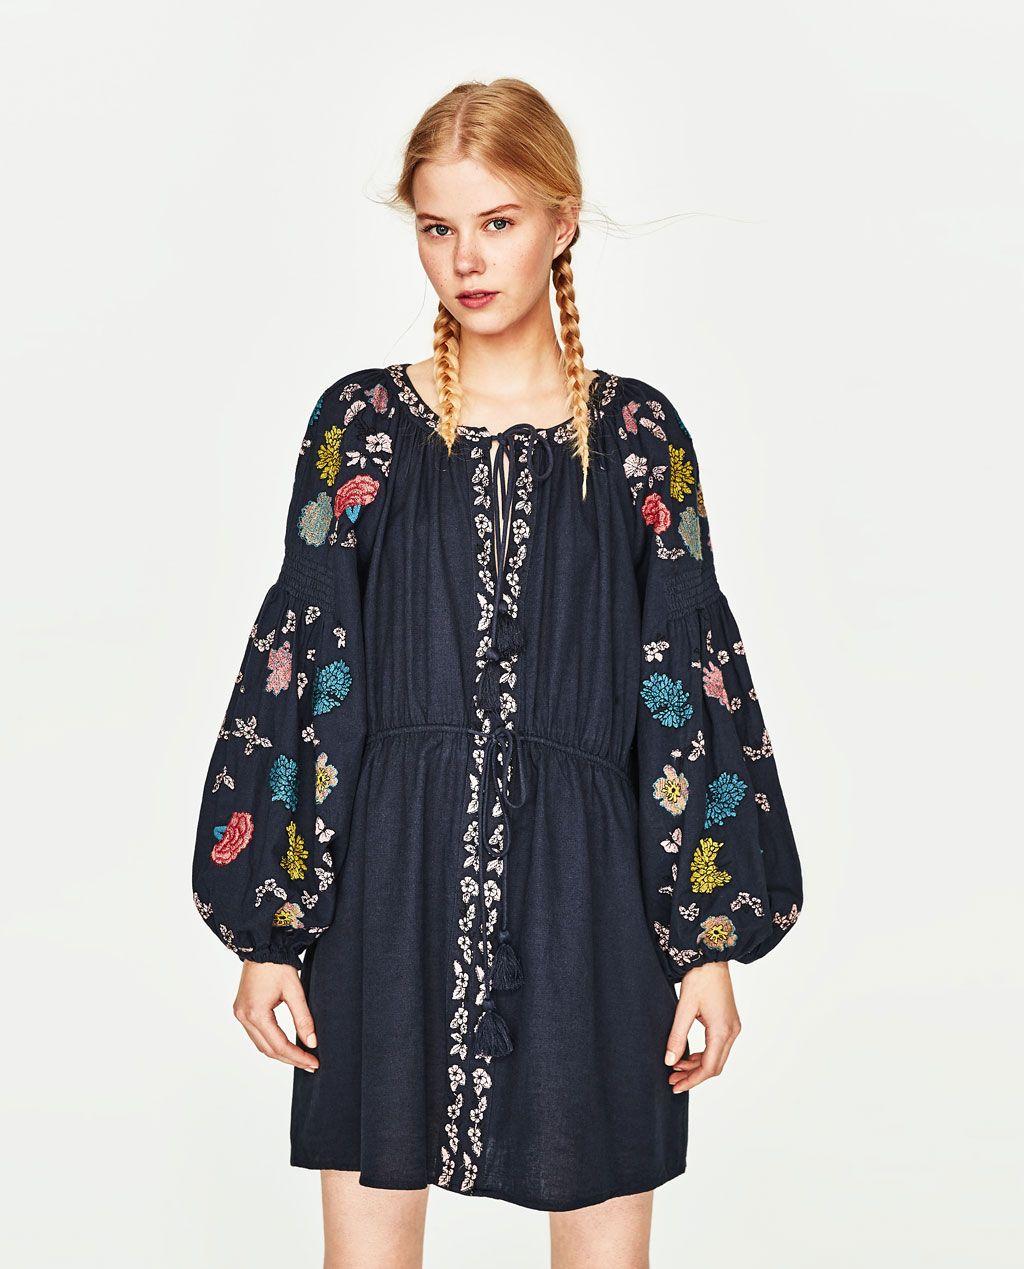 b01f920d Image 2 of SHORT TUNIC DRESS from Zara | Zara wish list in 2019 ...